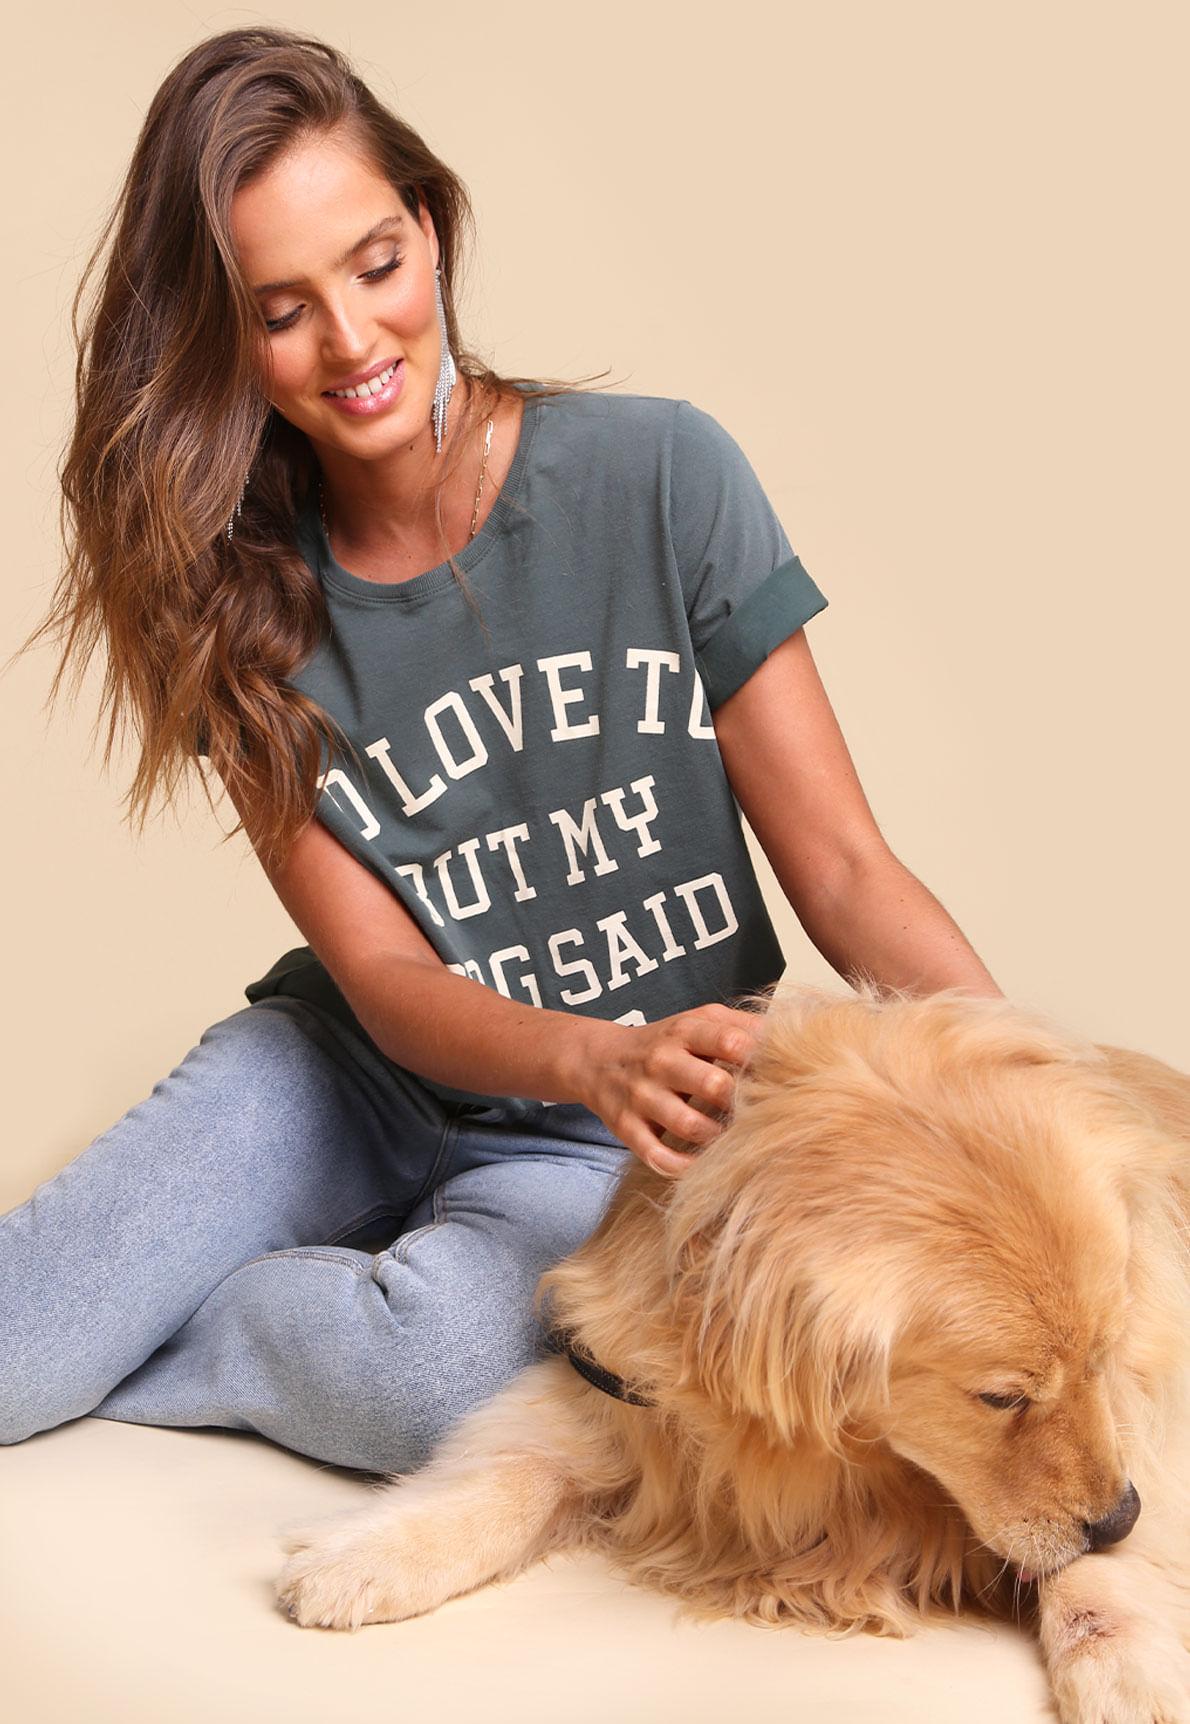 31370-t-shirt-my-dog-said-no-01